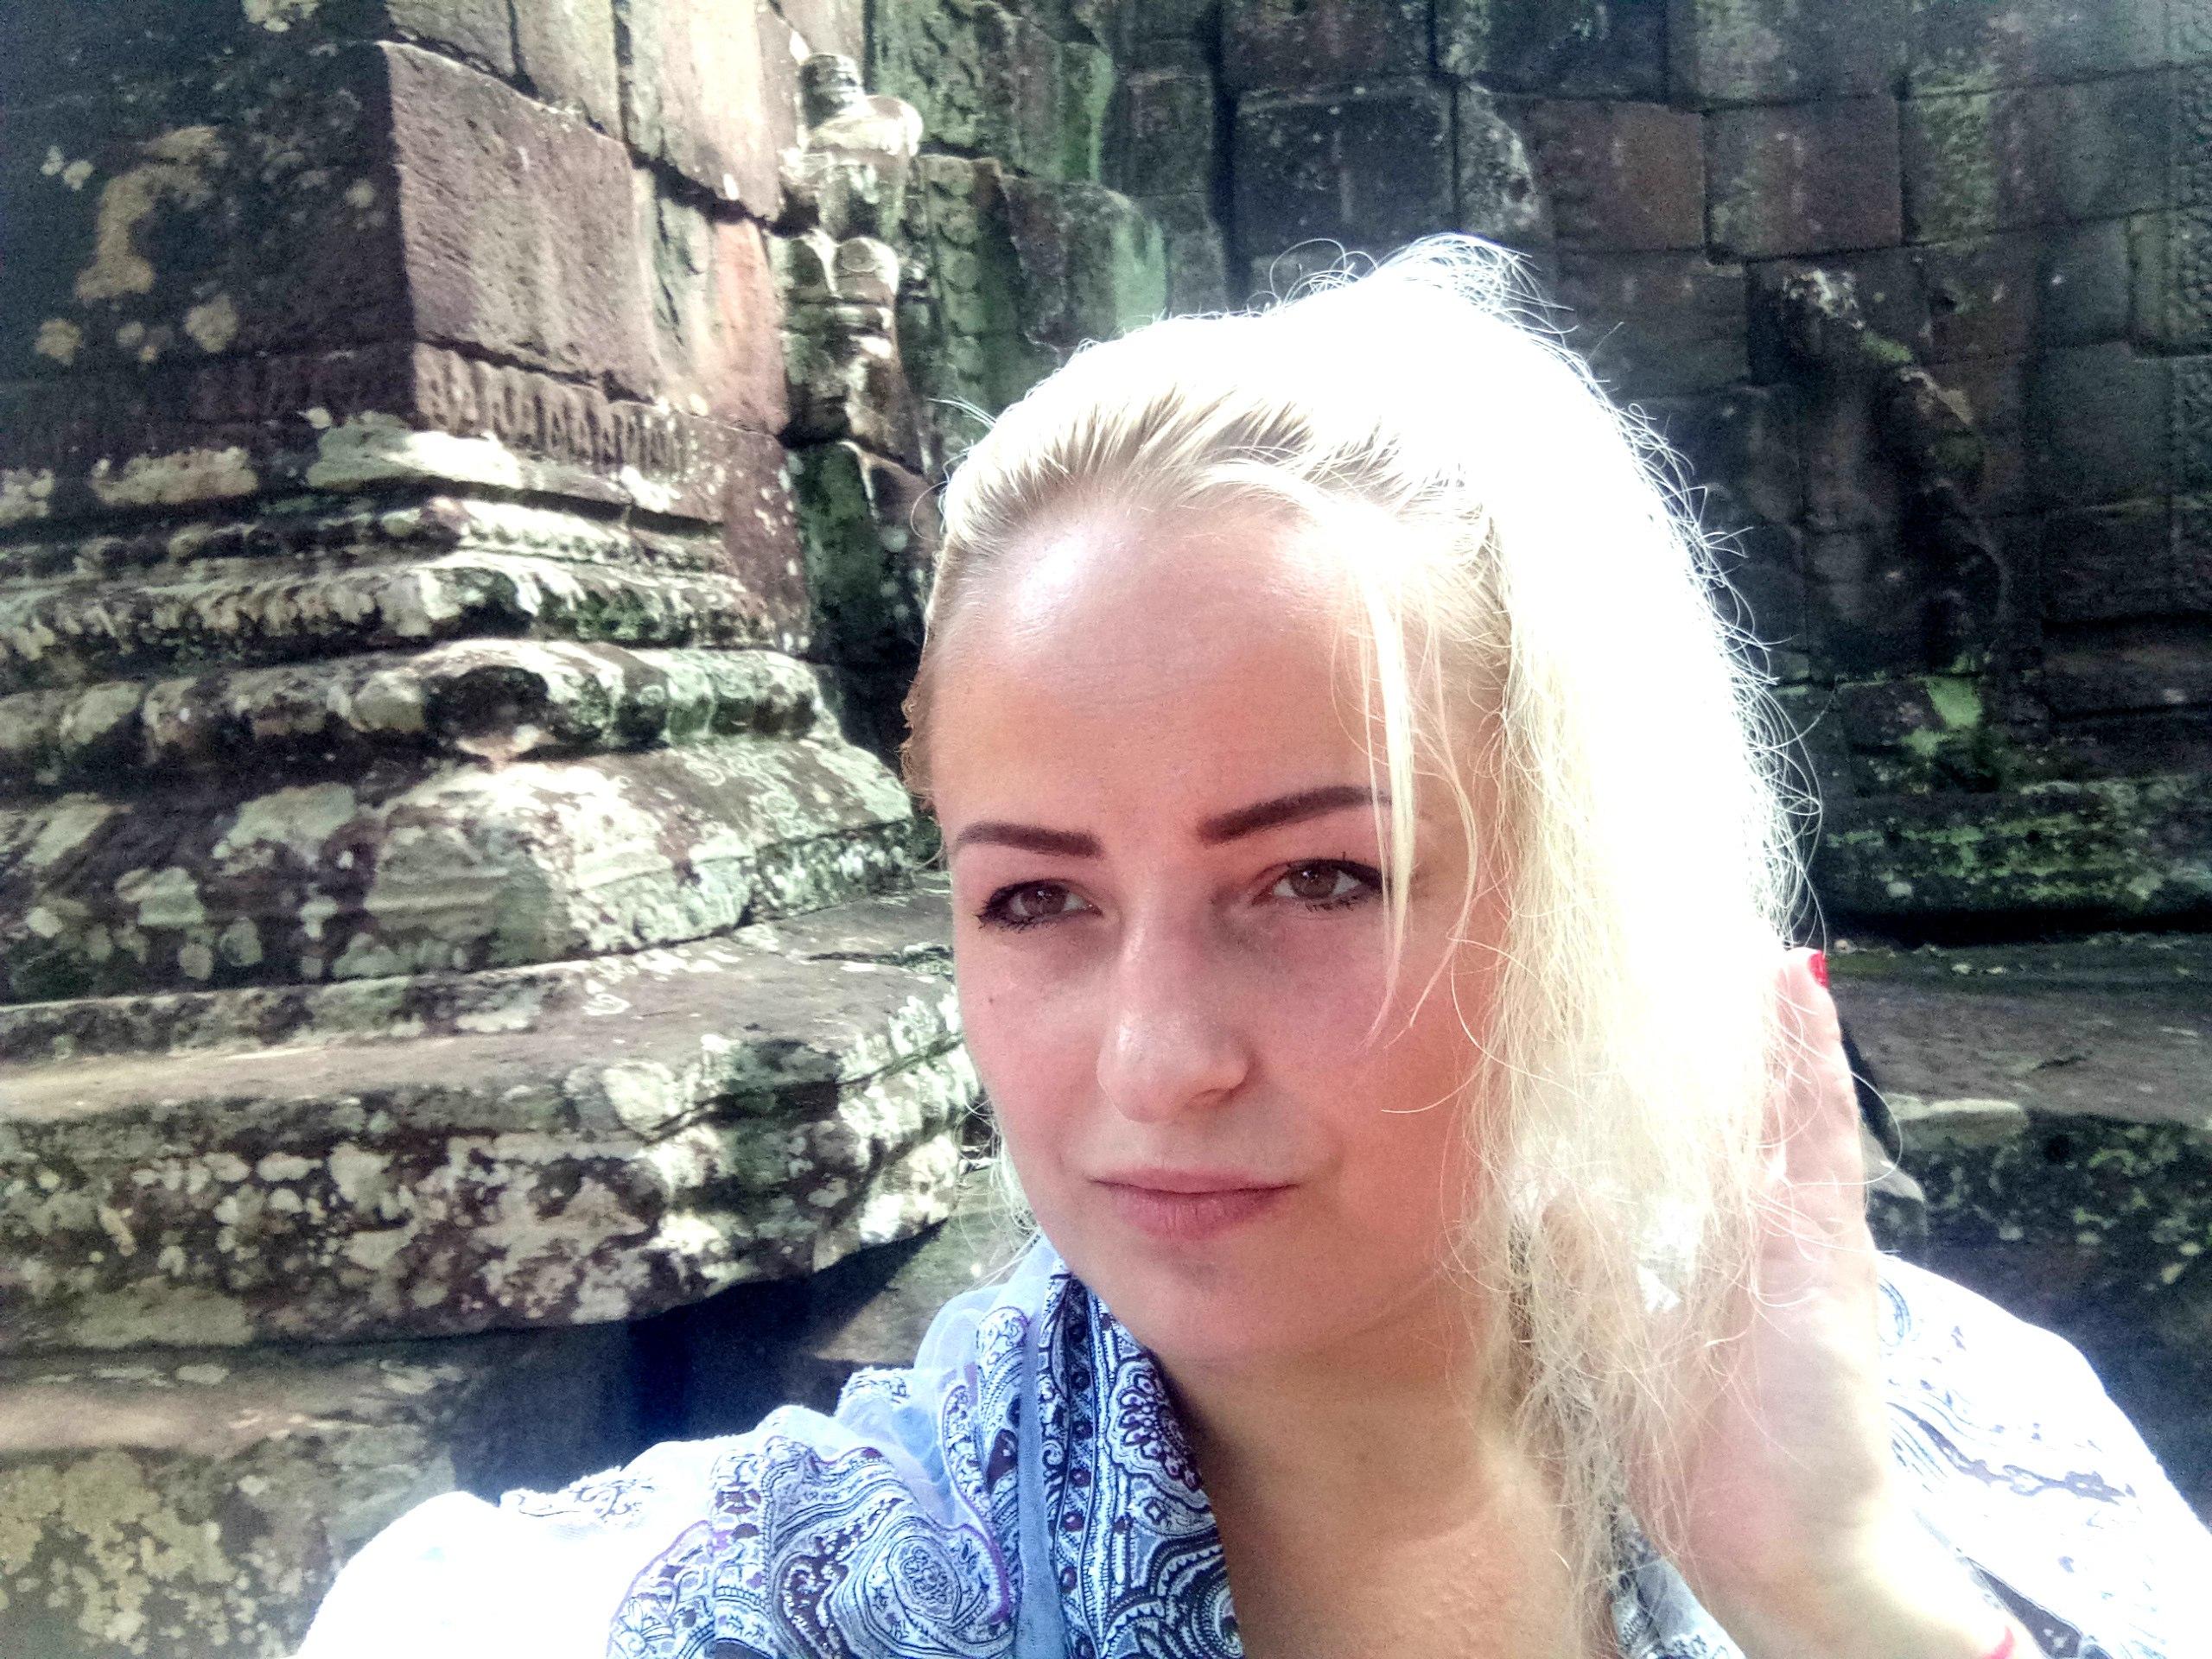 Елена Руденко (Валтея). Камбоджа. Ангкор. - Страница 3 5tAJEp7tTQE